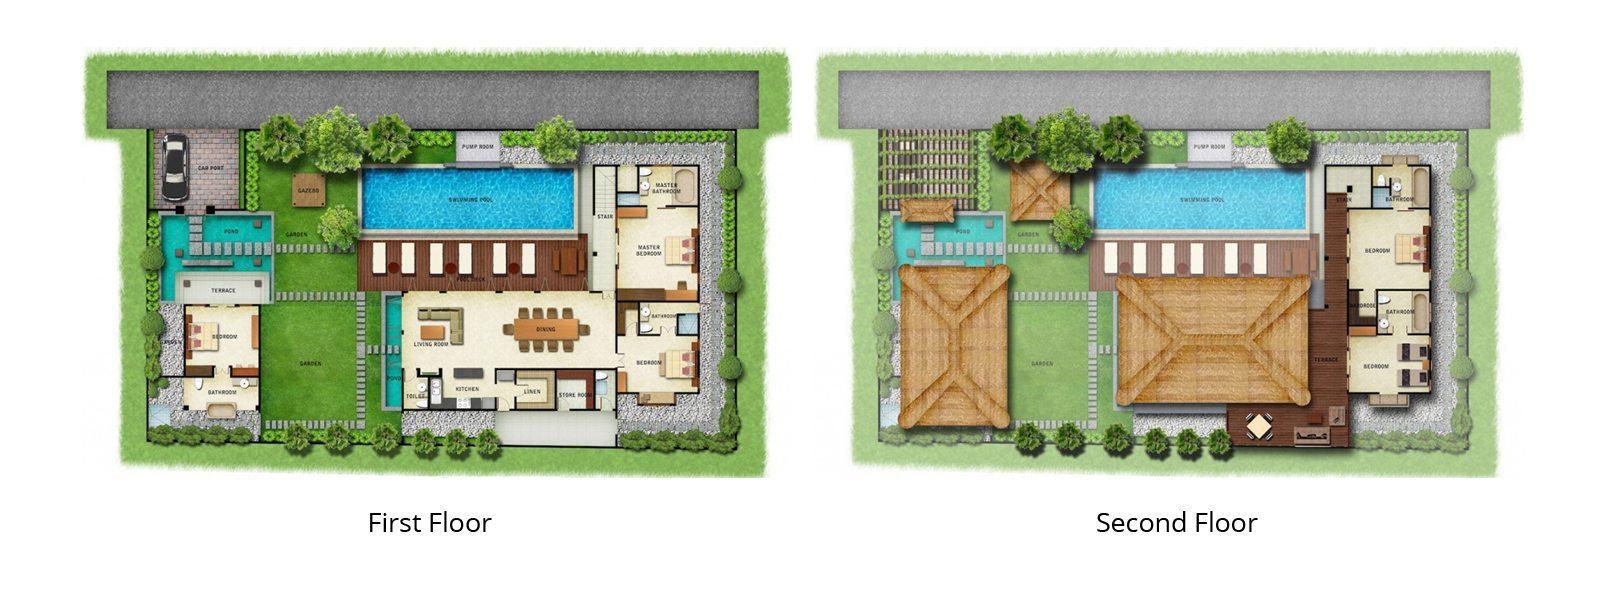 Villa Nilaya Residence Floorplan | Seminyak, Bali